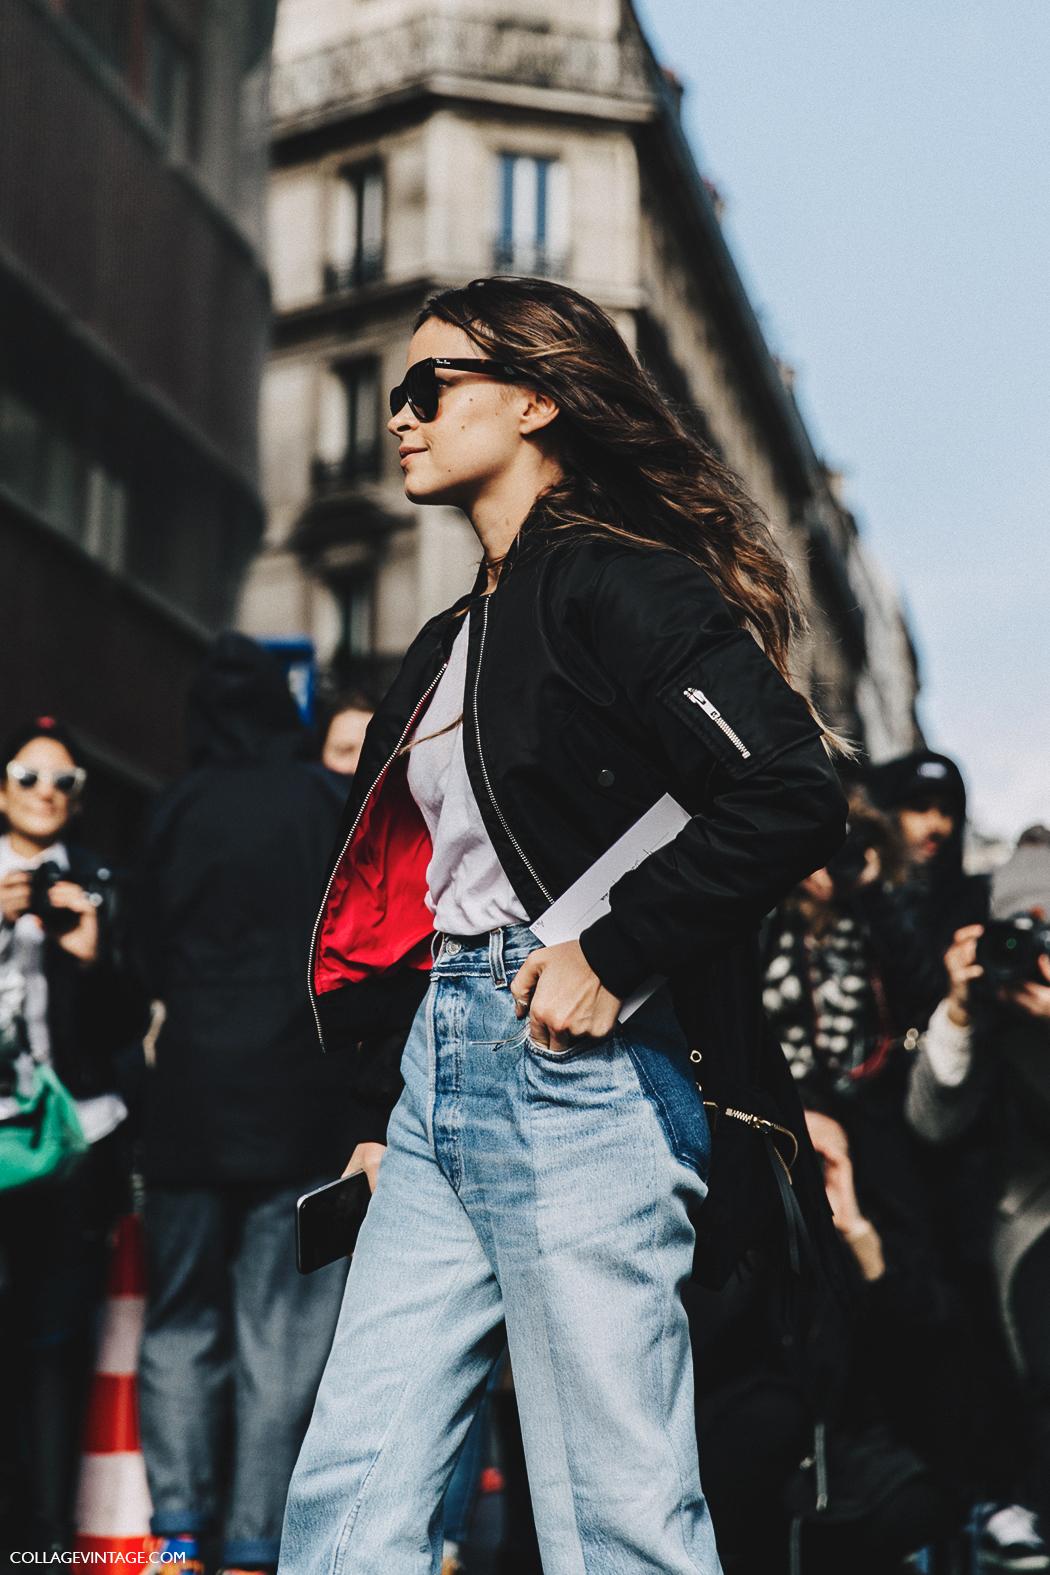 PFW-Paris_Fashion_Week_Fall_2016-Street_Style-Collage_Vintage-Miroslava_Duma-Vetements-Jeans-Backpack-Bomber-10